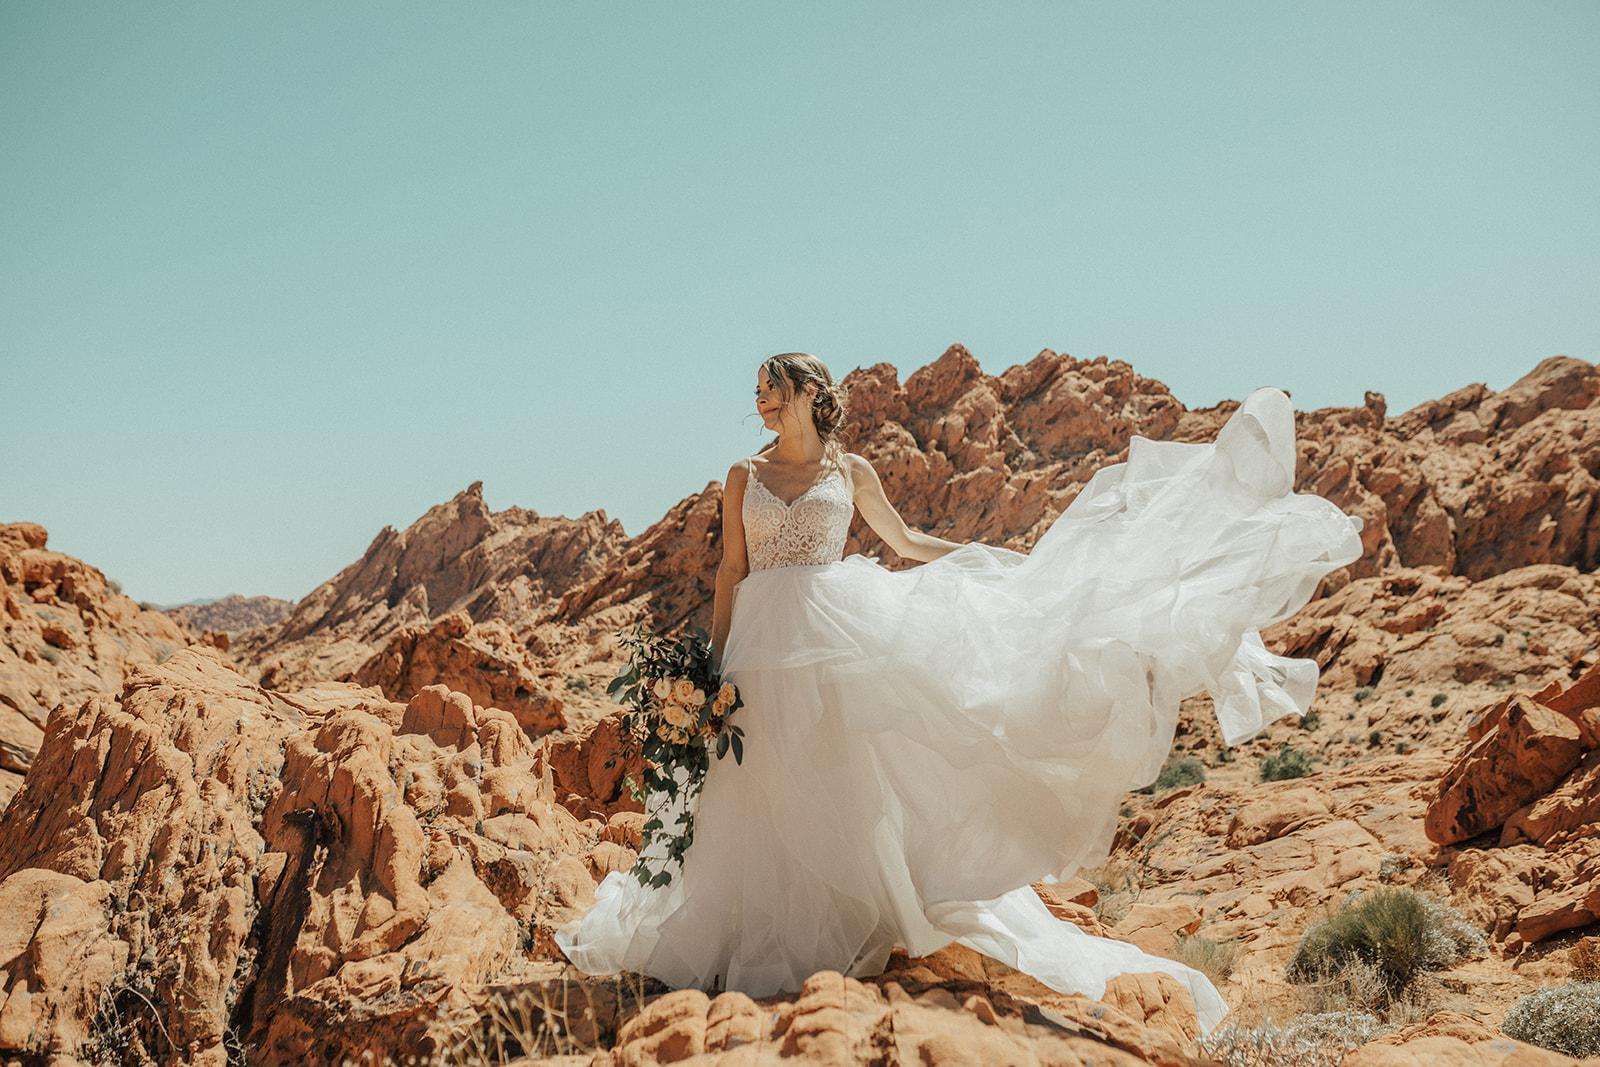 ballgown spokane bridal shop desert elopement